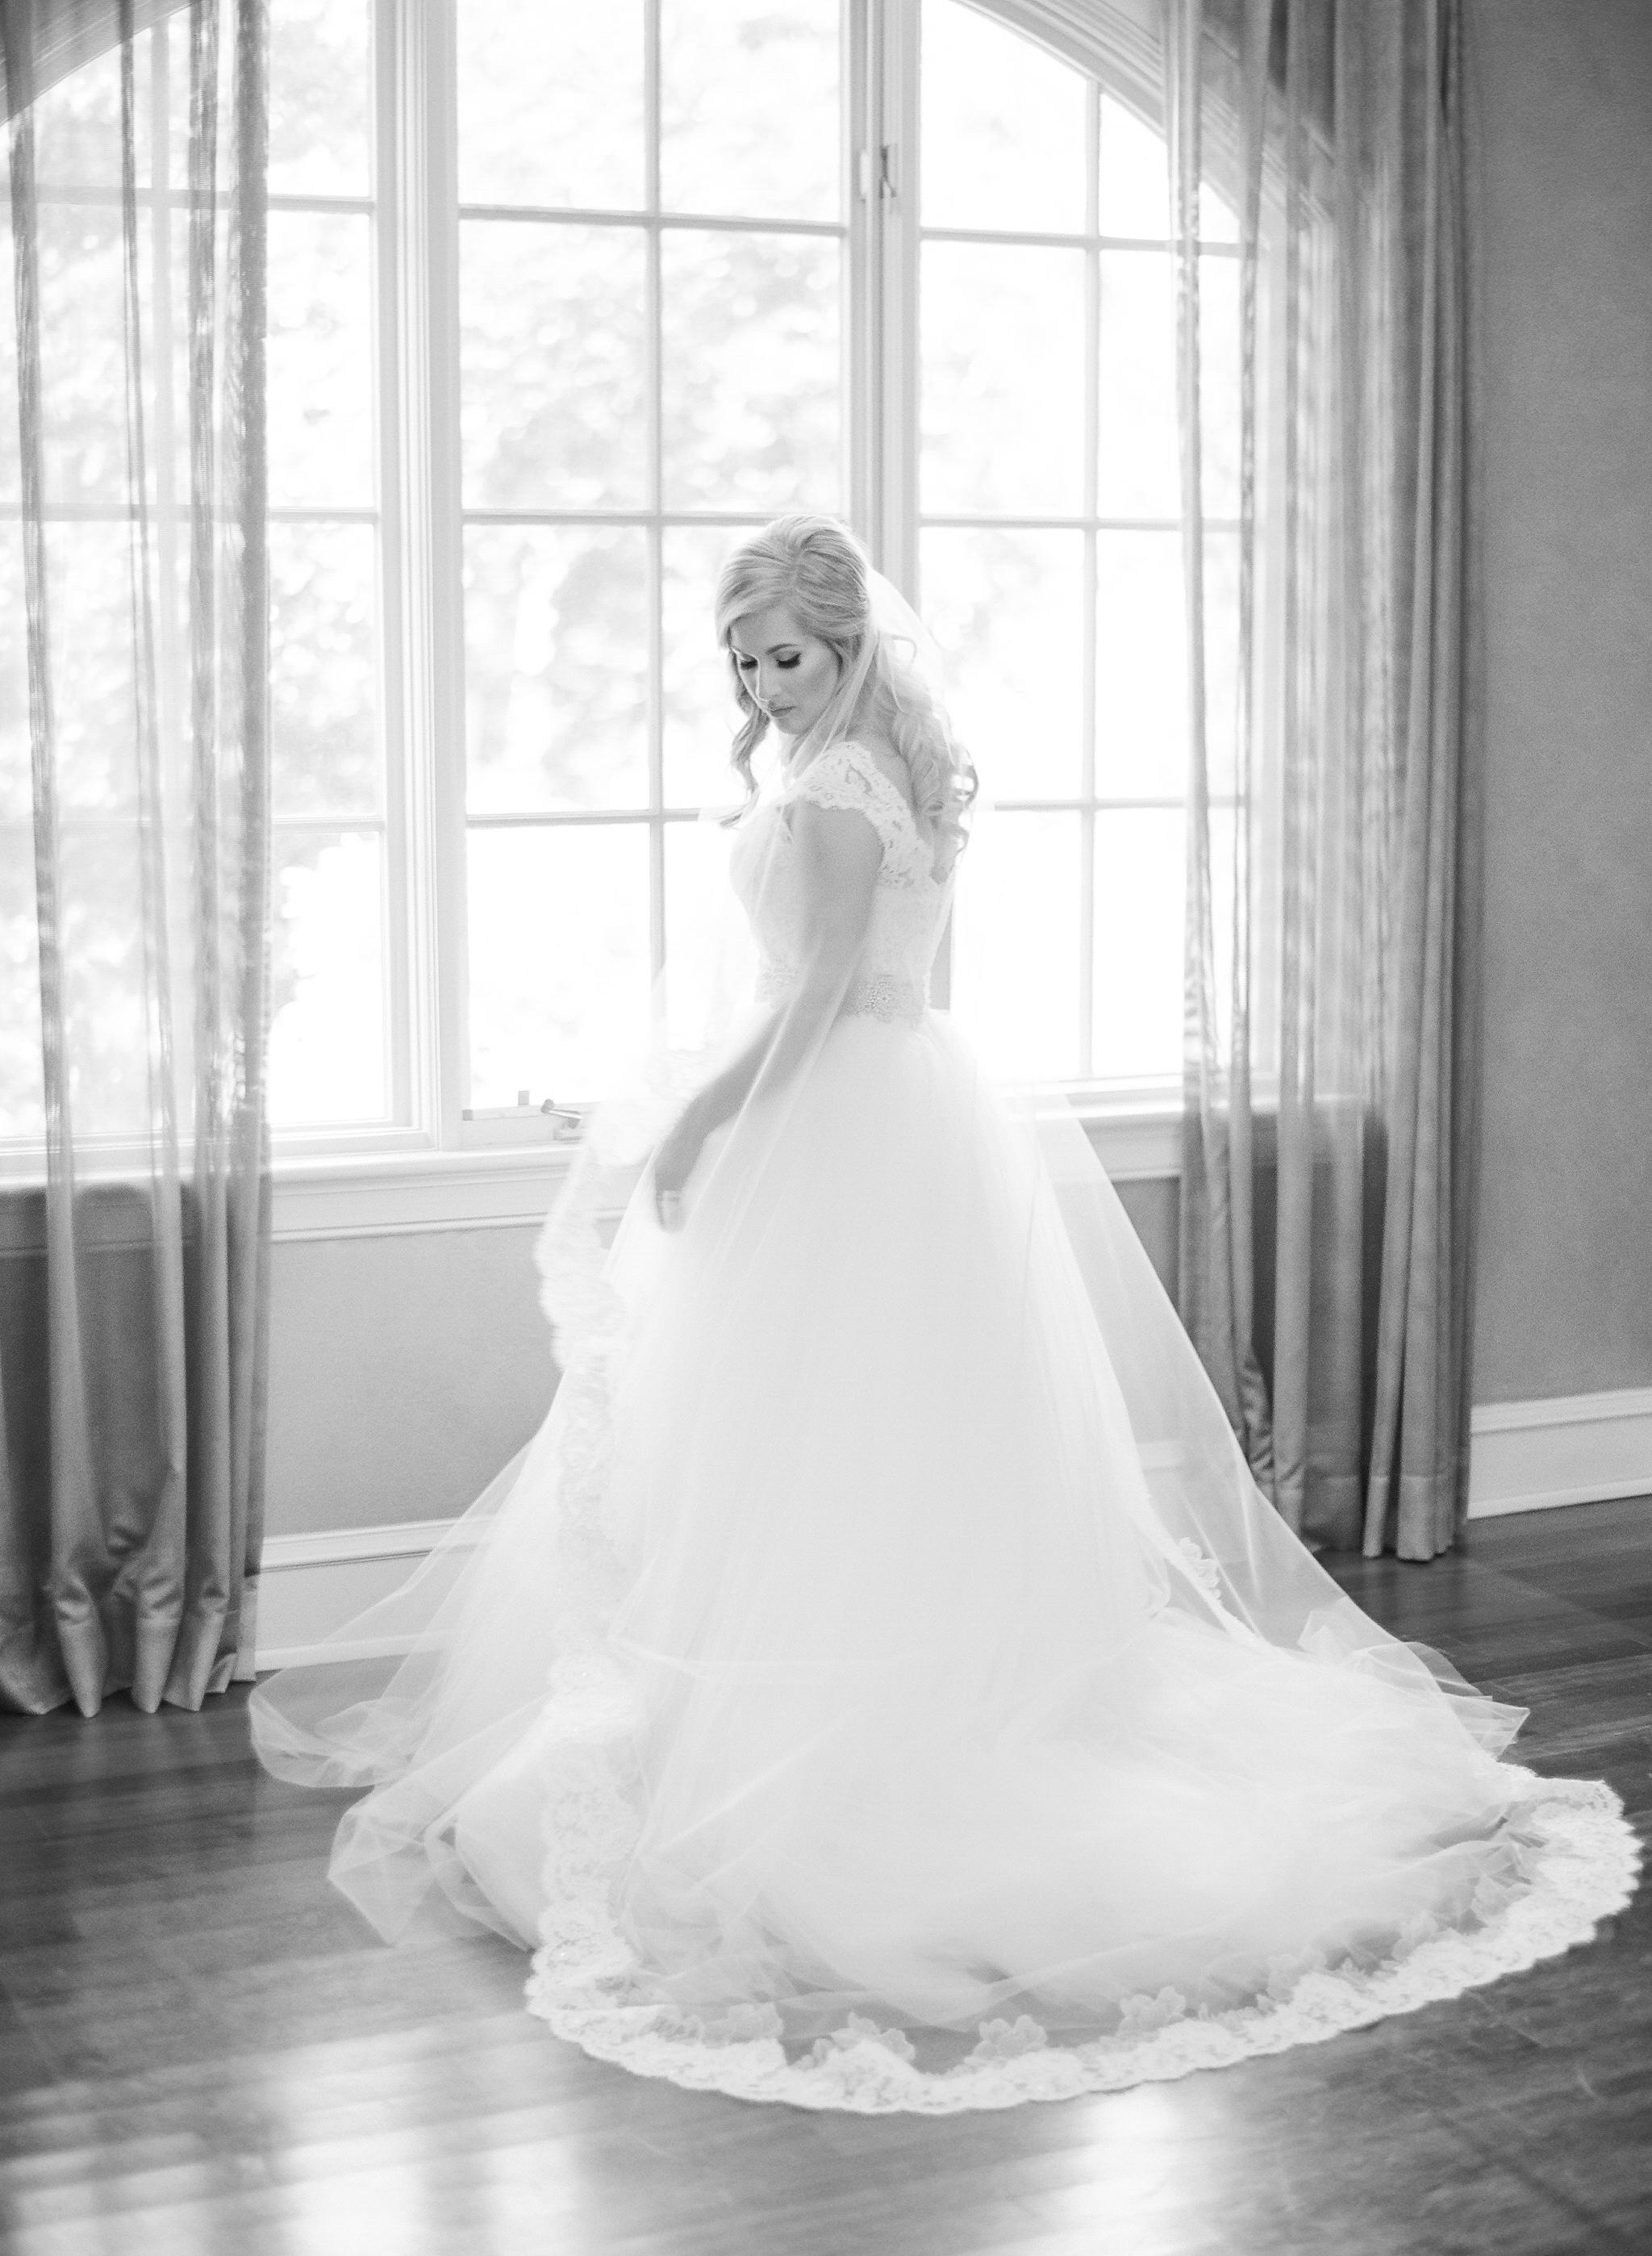 Ceci_New_York_Florida_Wedding_Style_Bride_Watercolor_Real_Custom_Luxury_33.jpg